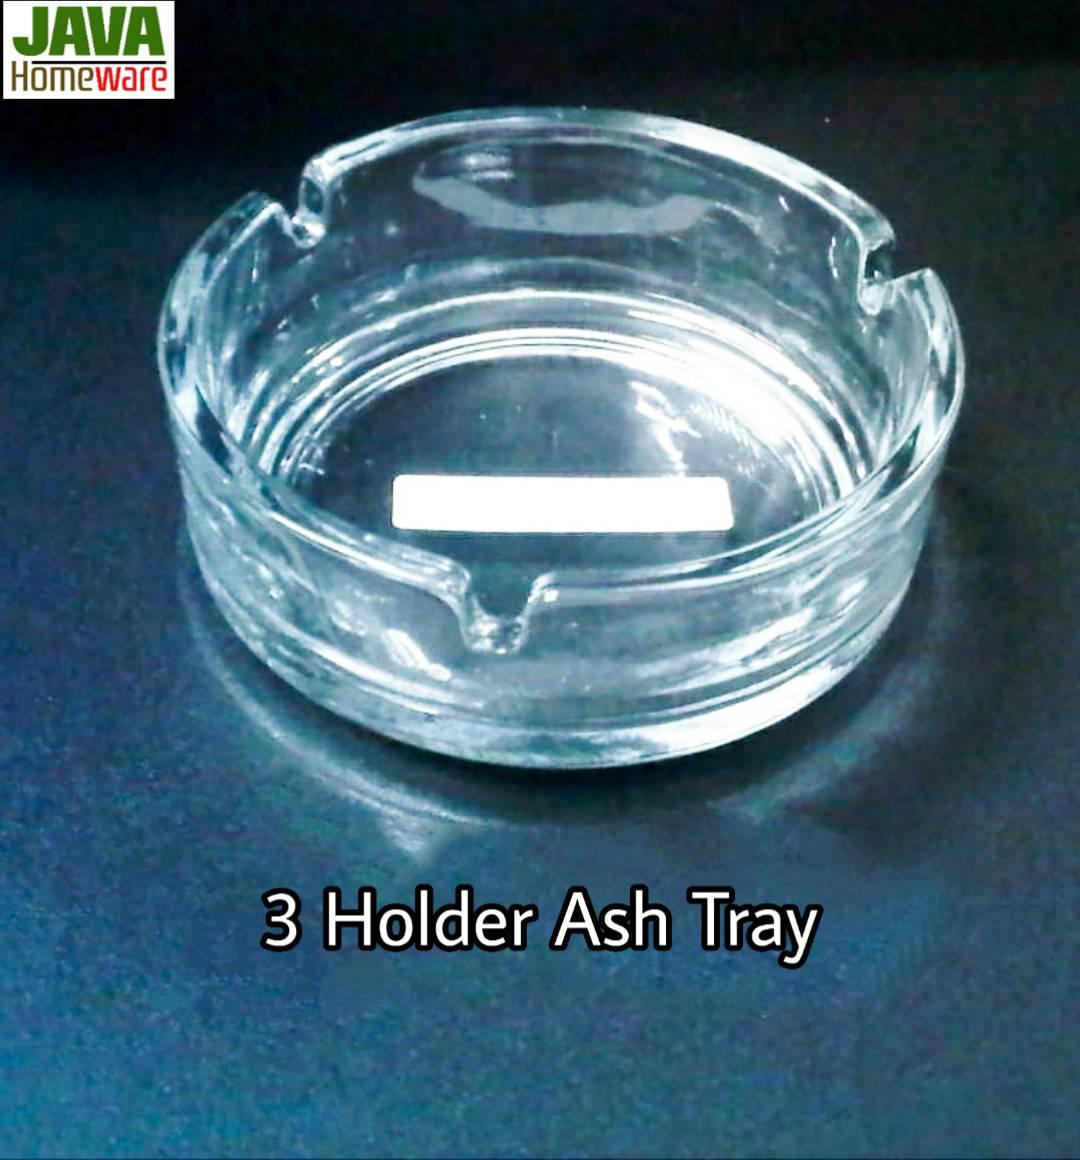 3 Holder Ash Tray